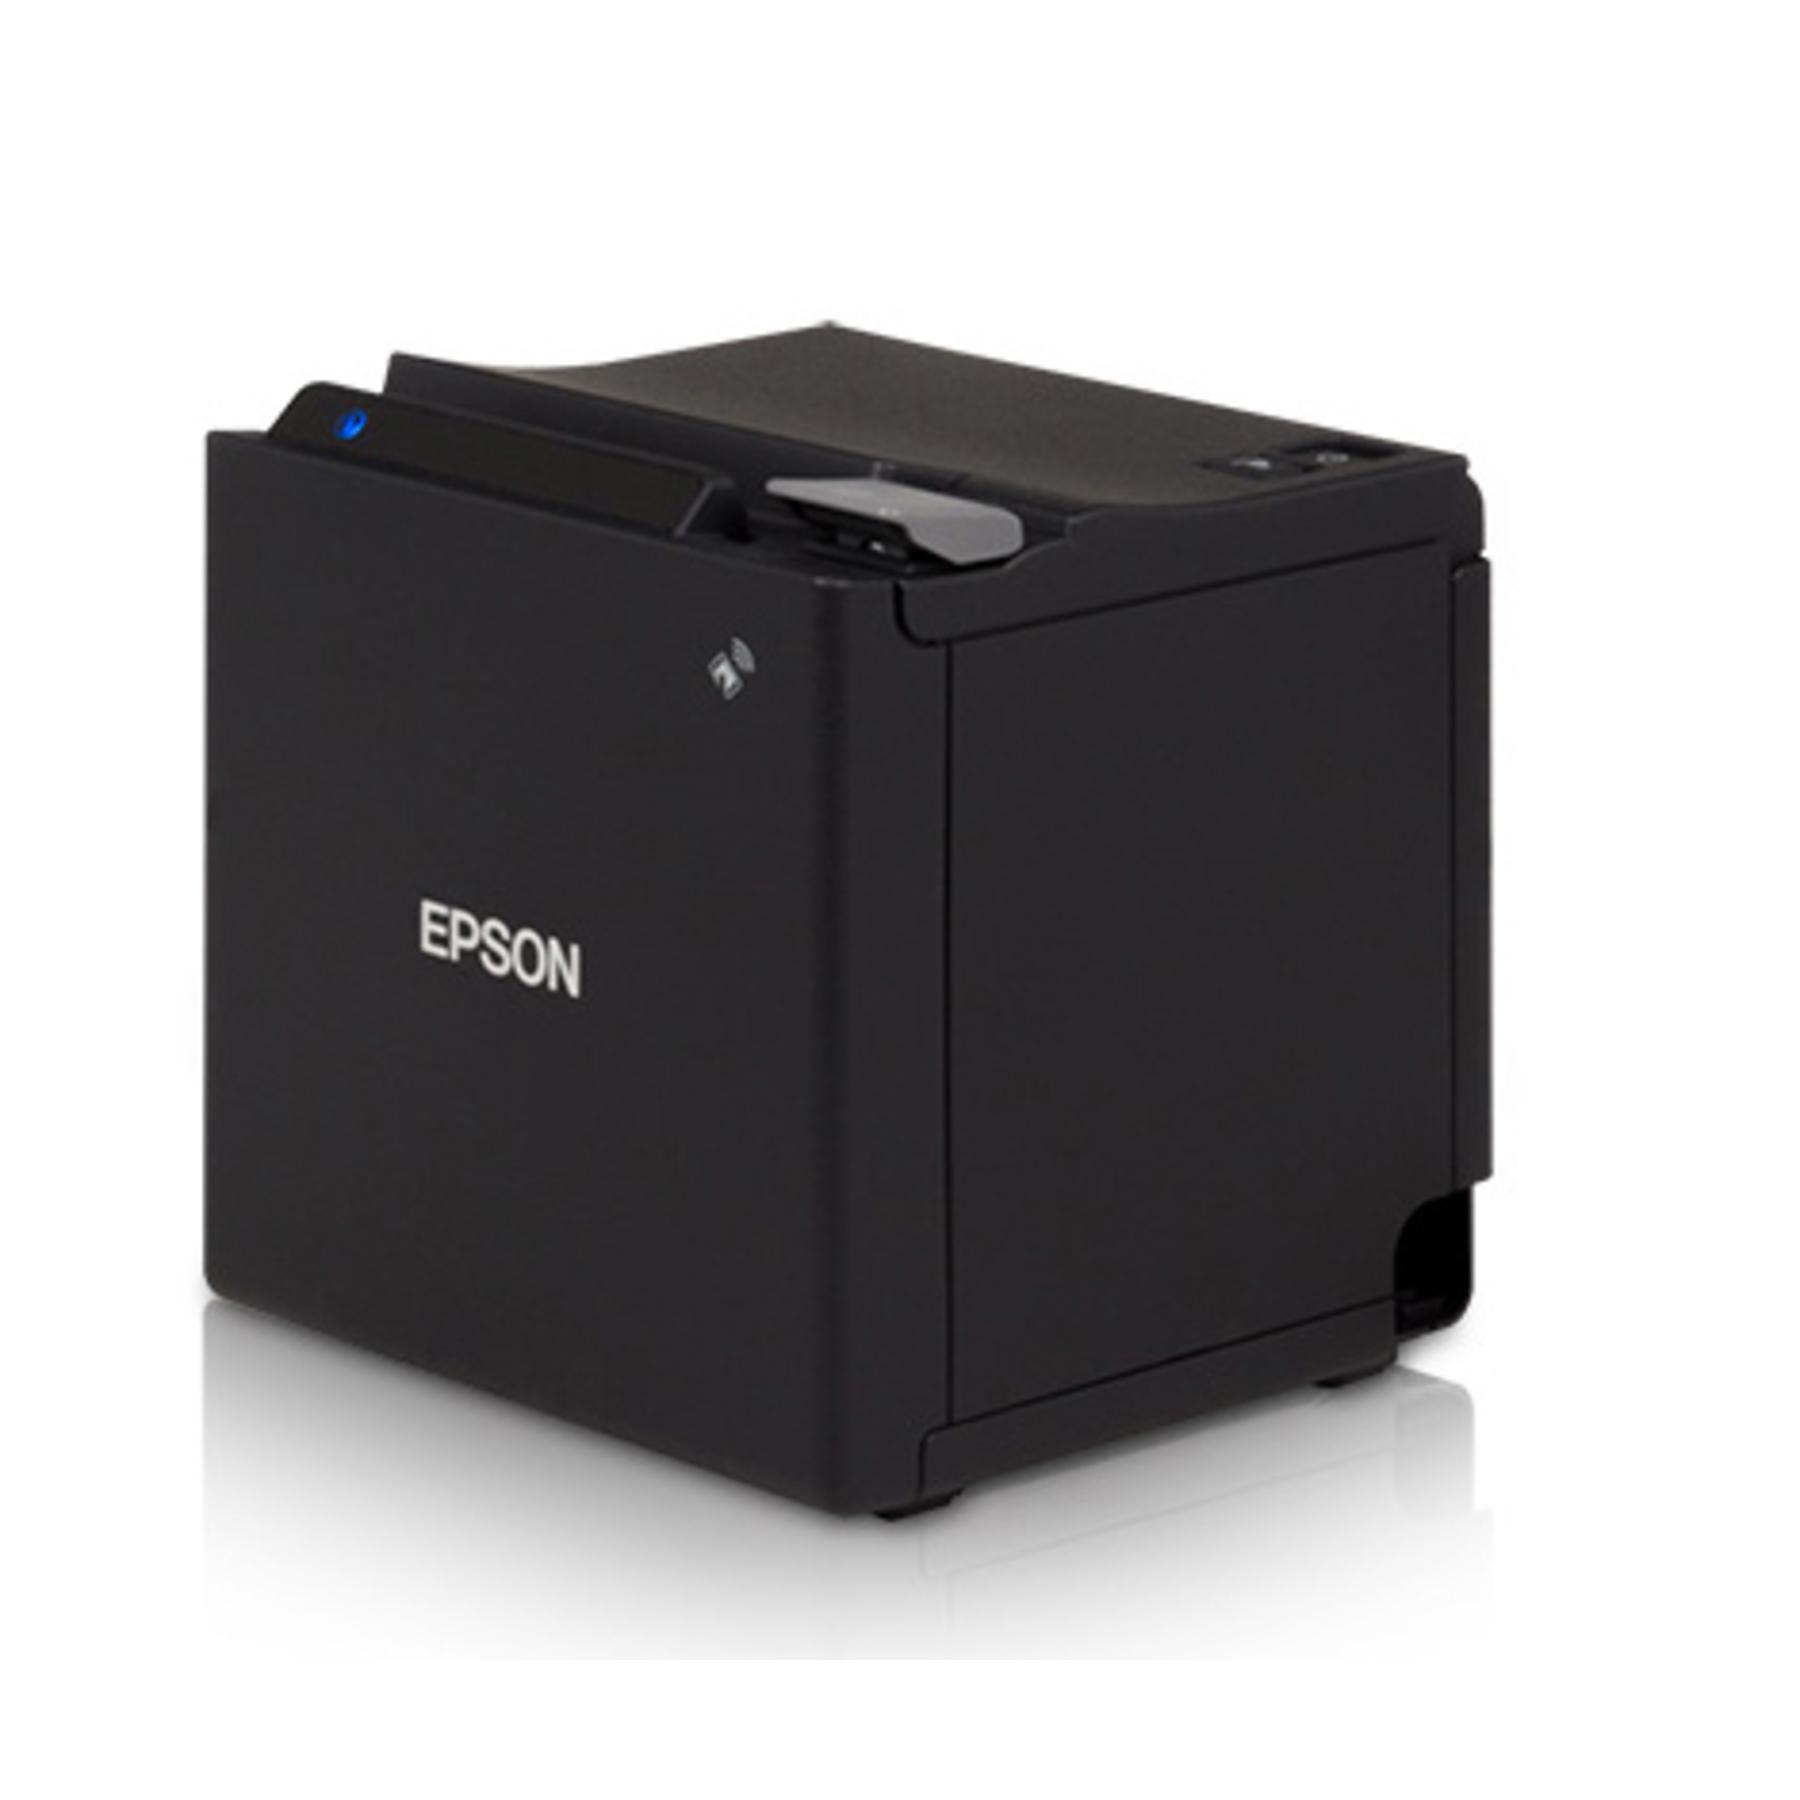 Epson Tm M30 Black Thermal Receipt Printer Cash Drawers